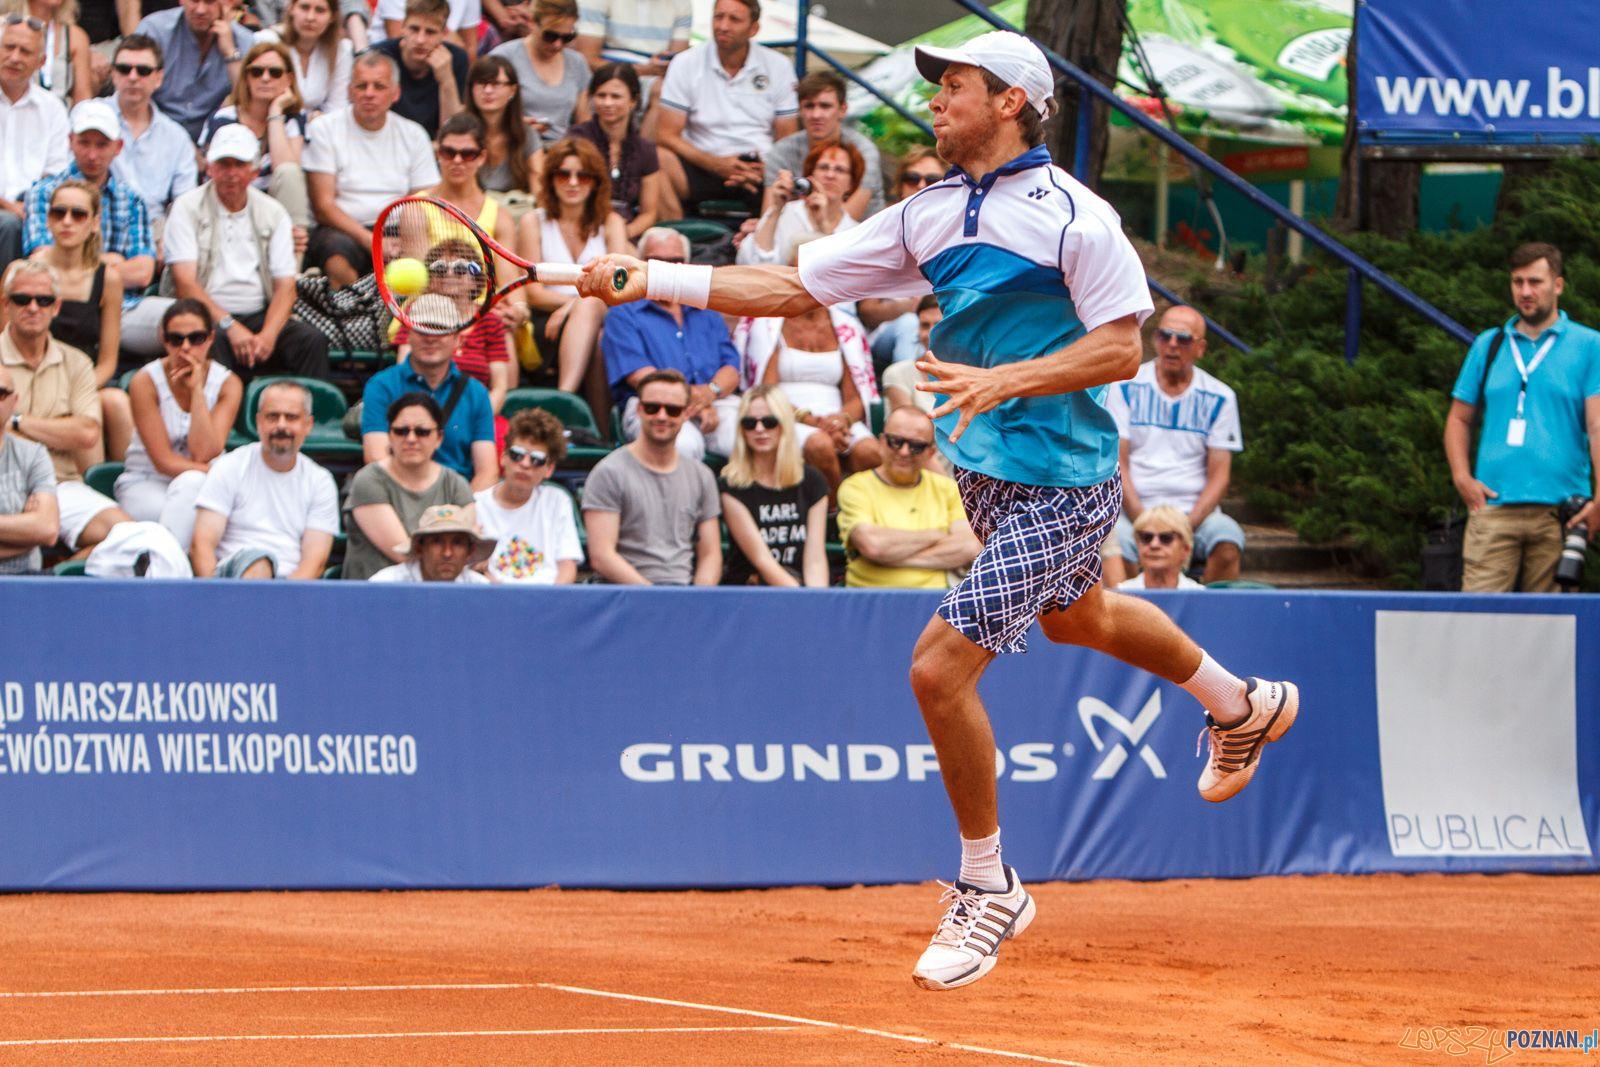 Pablo Carreno Busta (ESP) vs Radu Albot (MDA) - Poznań Open 201  Foto: Paweł Rychter